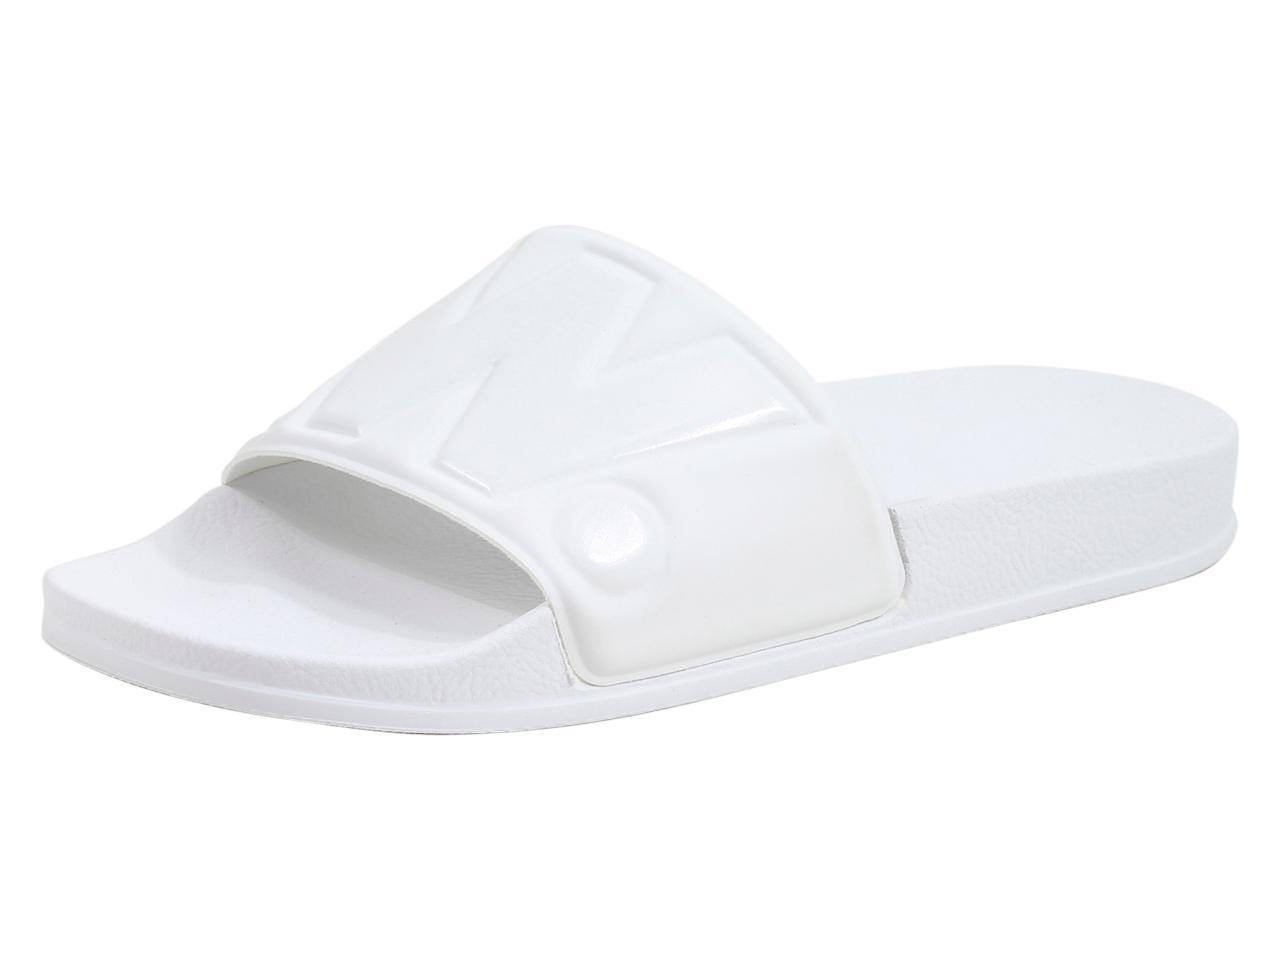 Image of G Star Raw Men's Cart Slide II Slides Sandals Shoes - White - 13 D(M) US